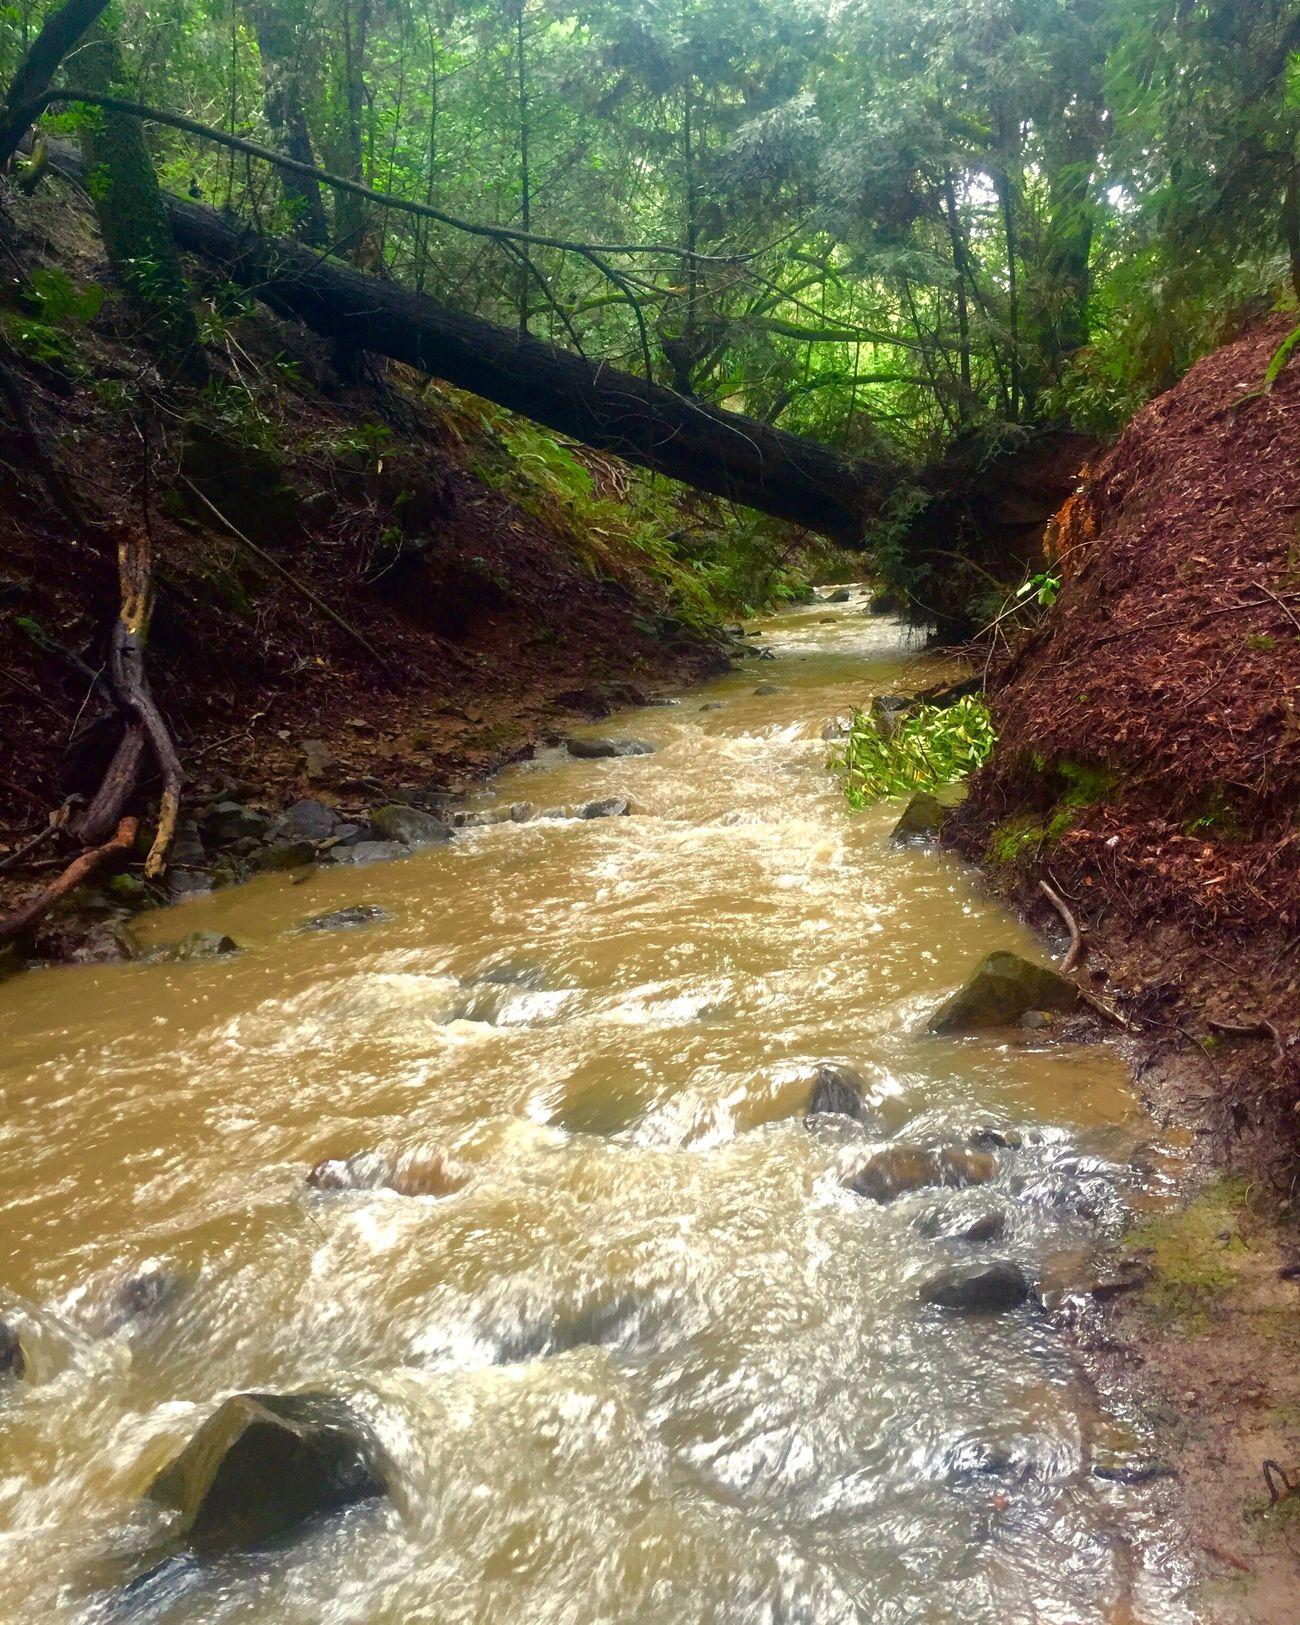 Chillin. Hello World Hanging Out Taking Photos Enjoying Life Hiking California Relaxing